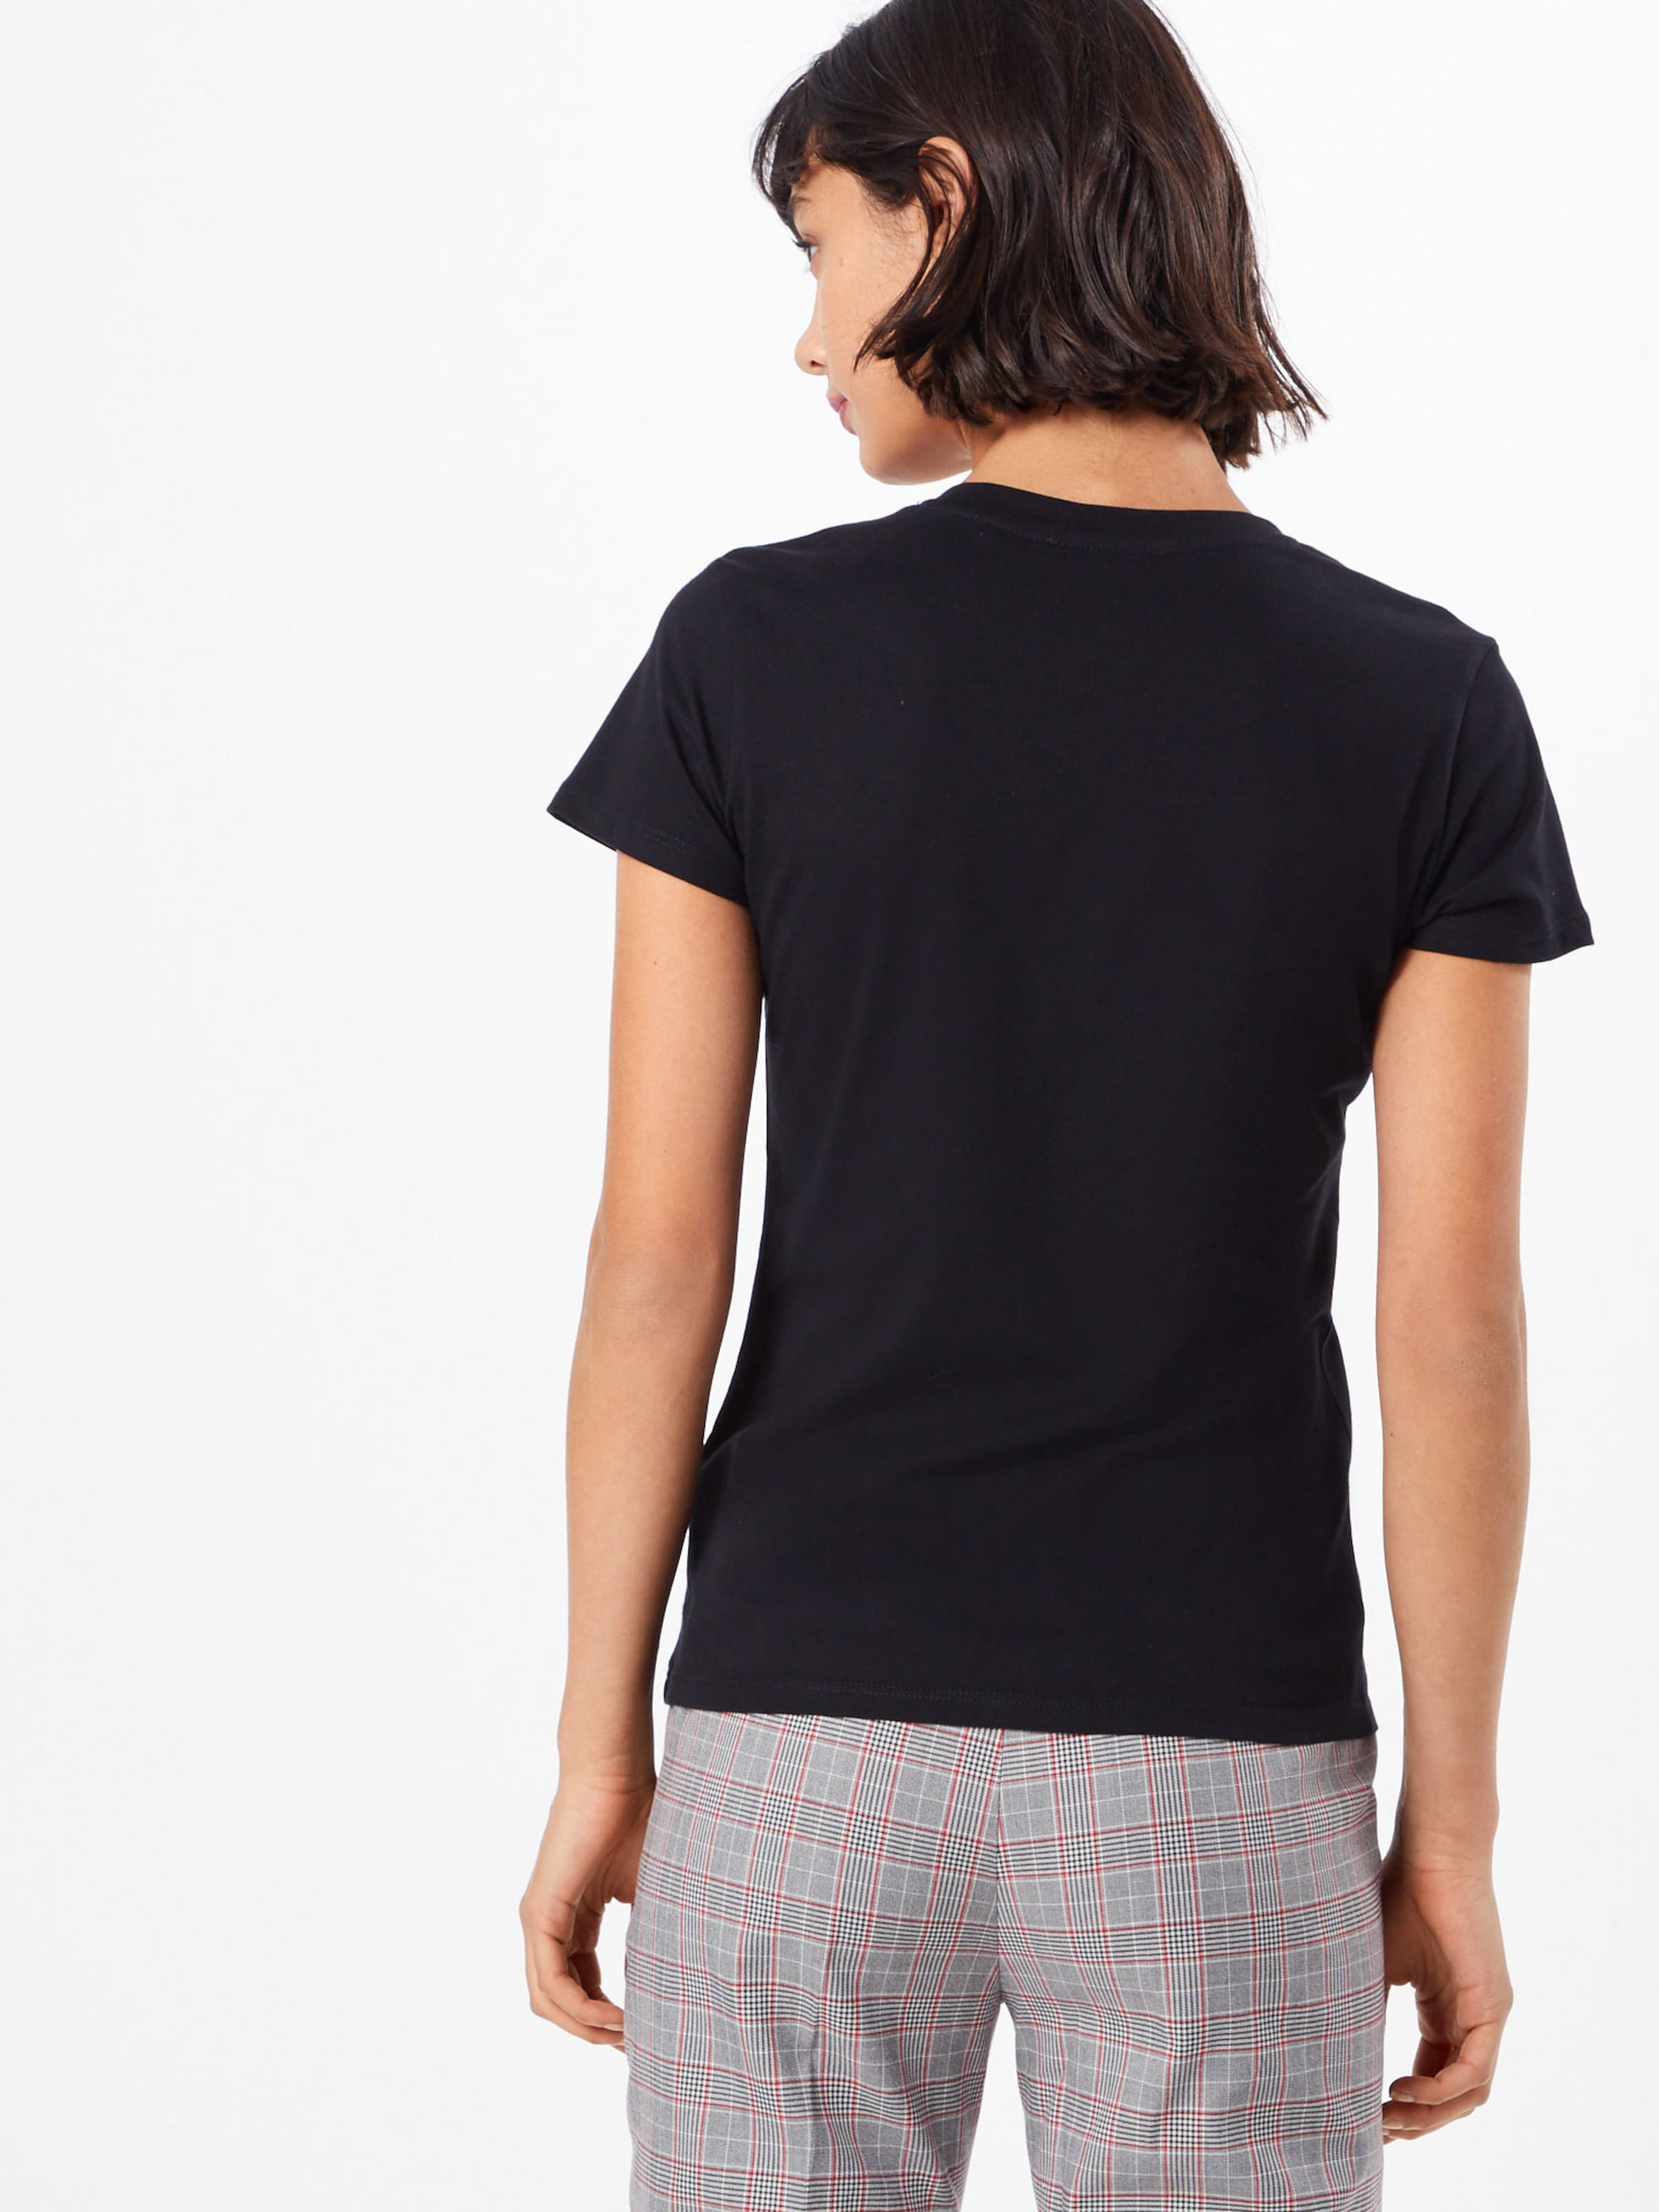 Zwart Zwart Guess Shirt Guess Shirt In In Guess rtxBsohQdC